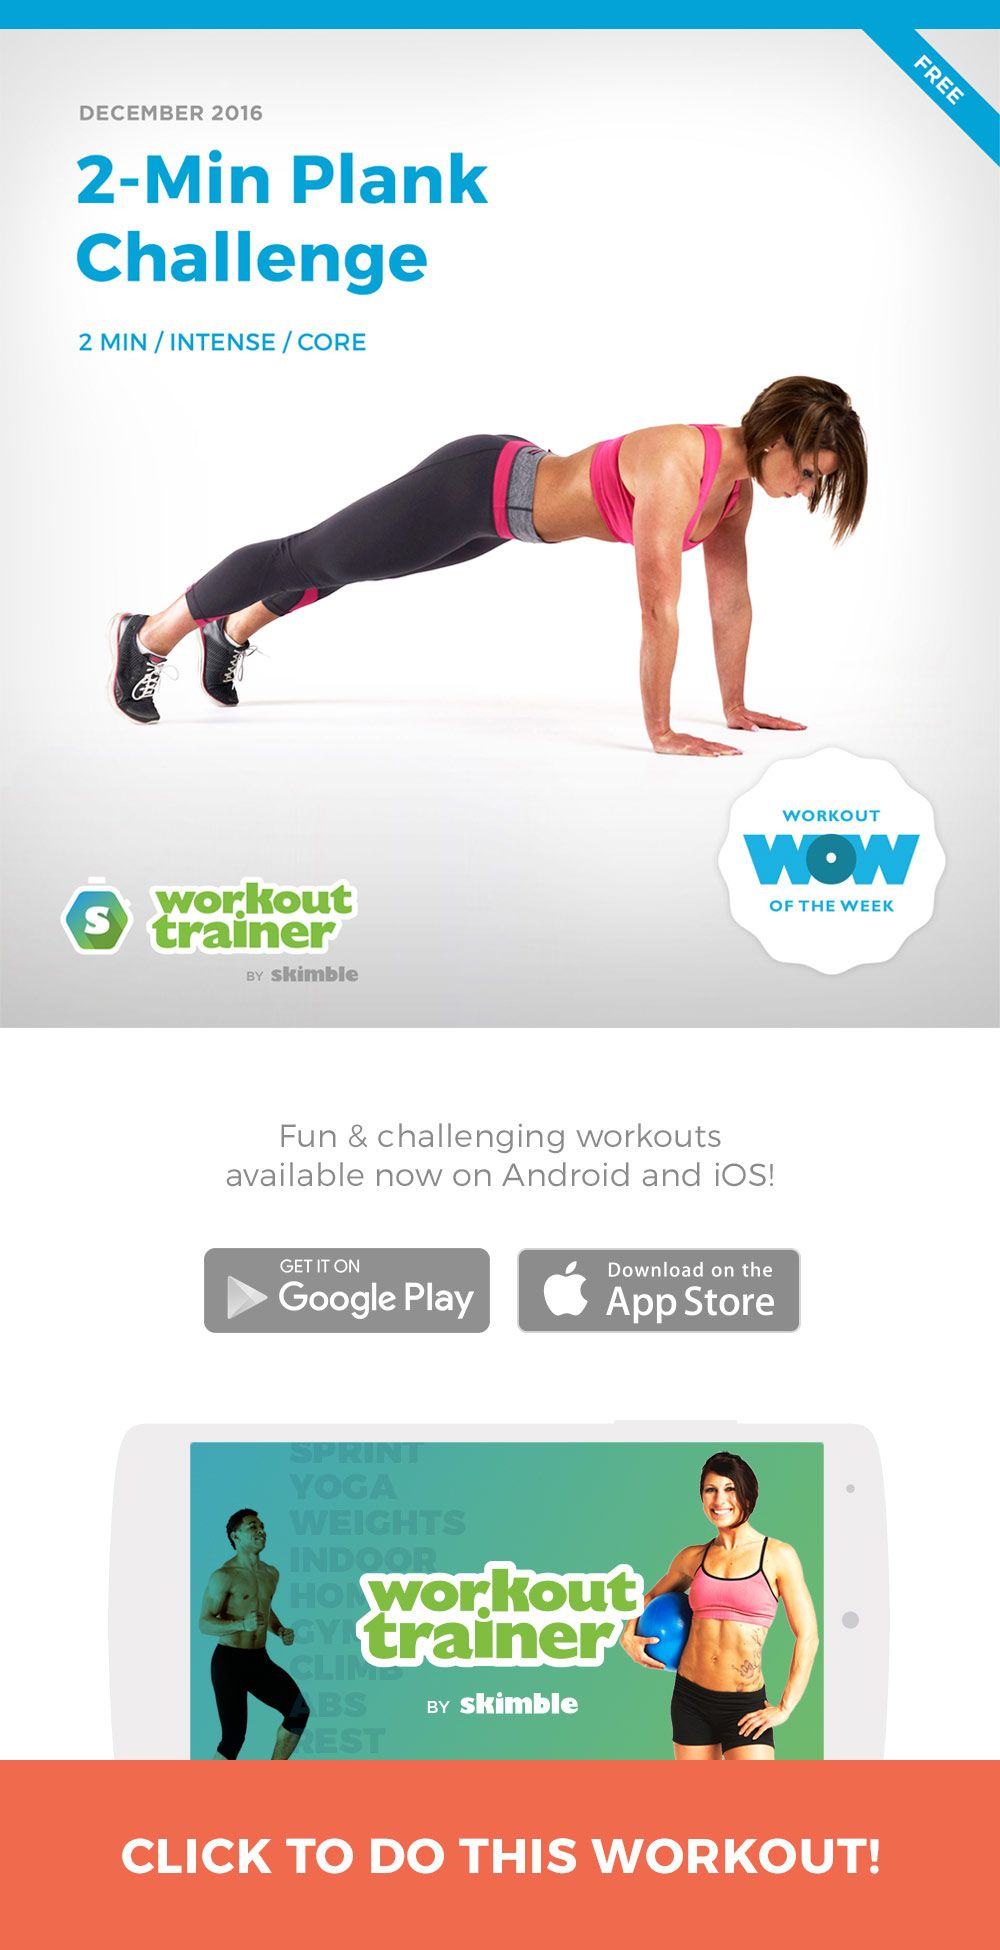 2Min Plank Challenge Plank challenge, Challenges, Workout